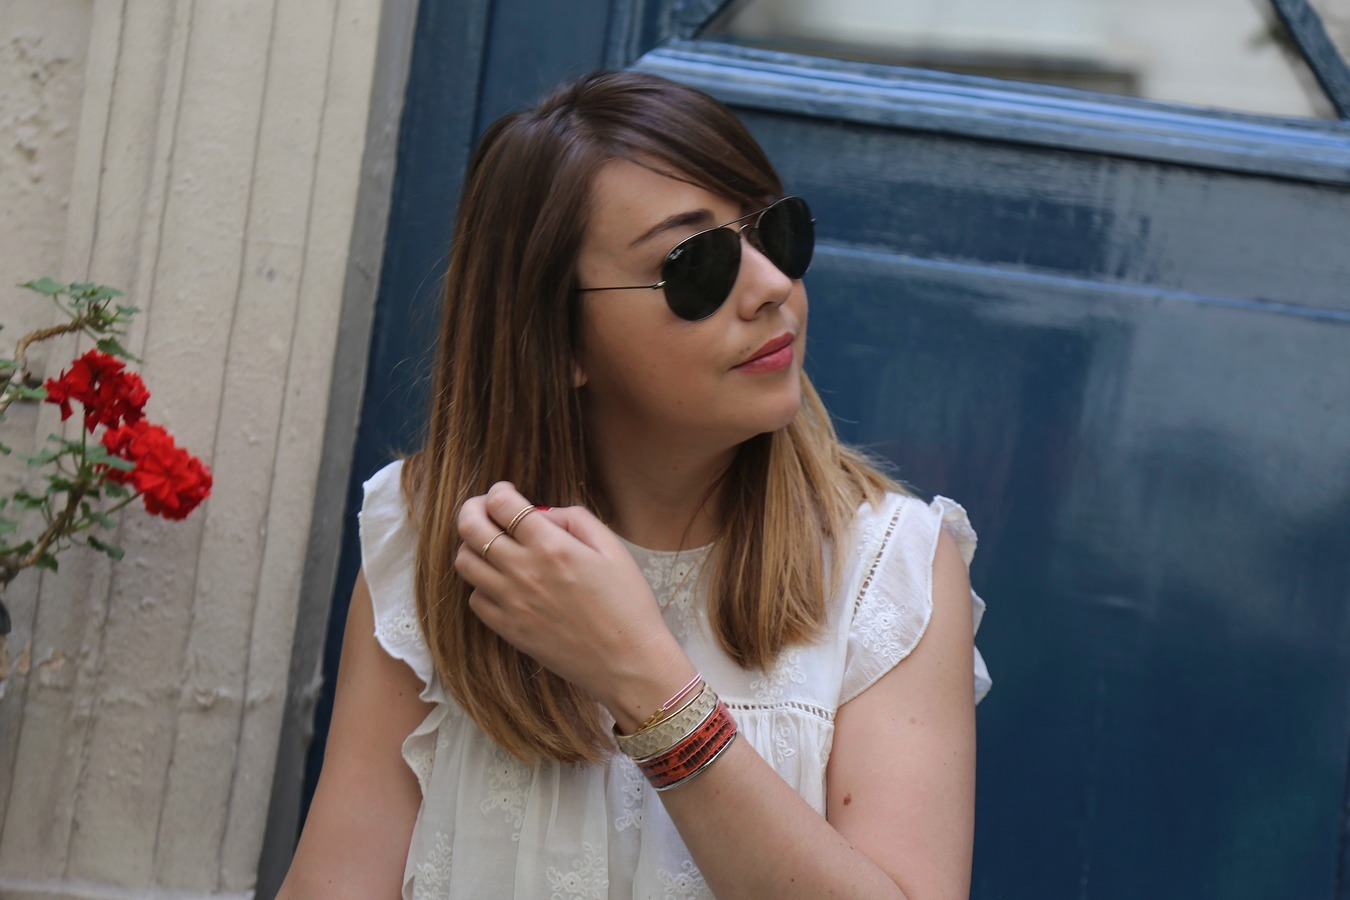 du style madame - blog mode femme - paris - streetstyle - look - kaki - dentelle - cimarron